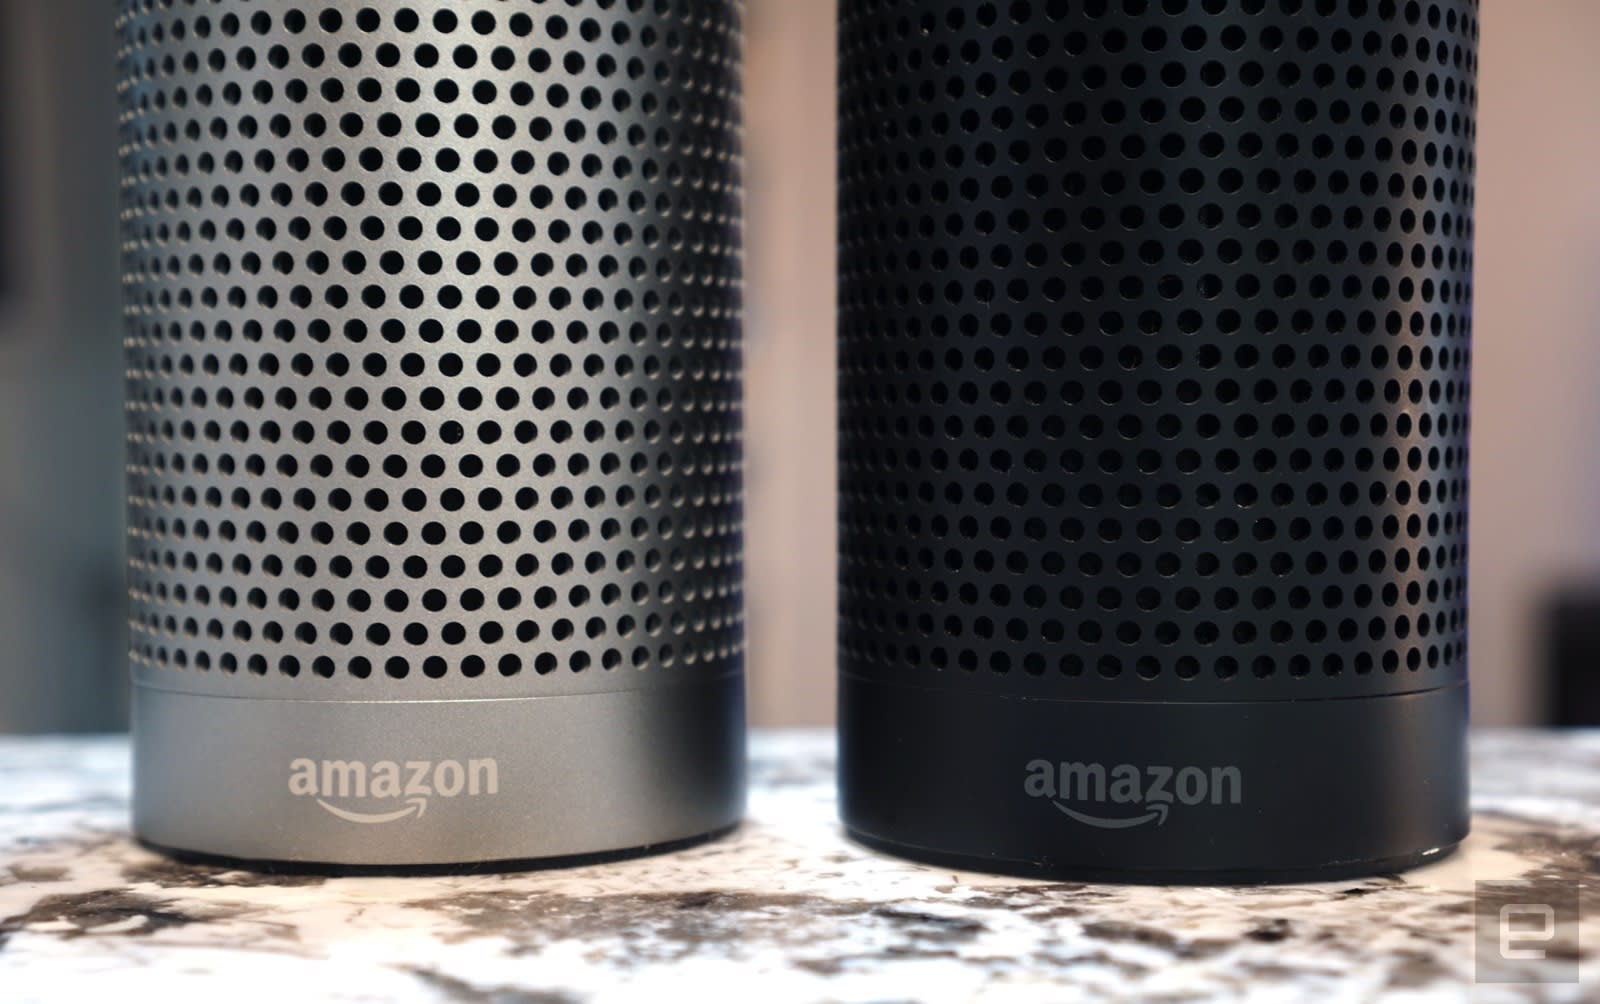 Amazon fixed an exploit that allowed Alexa to listen all the